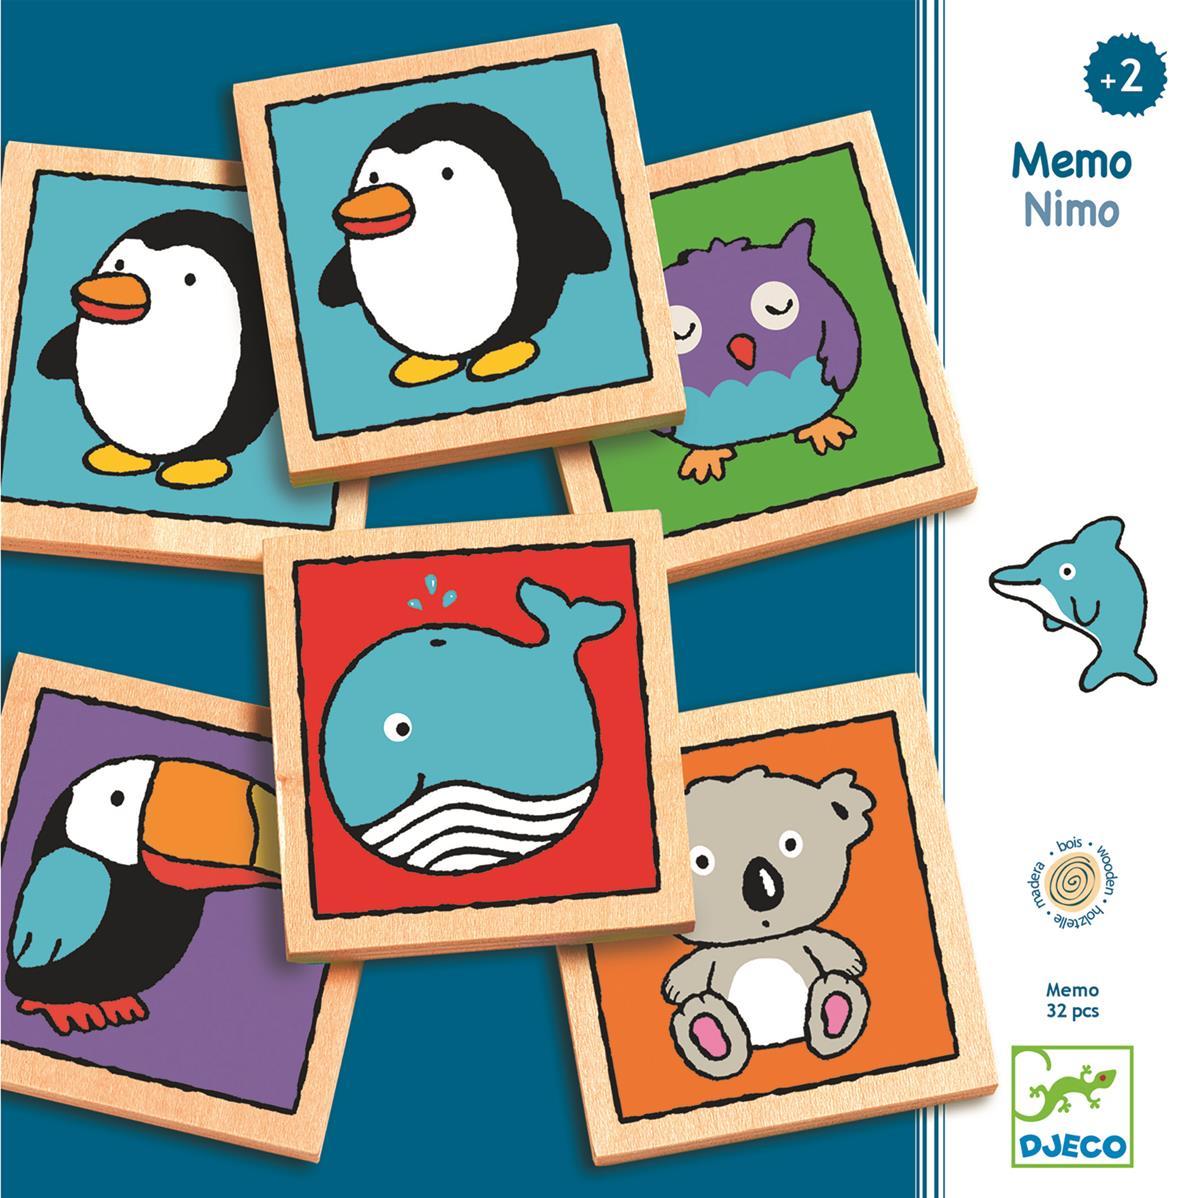 Memo drewniane NIMO | Djeco